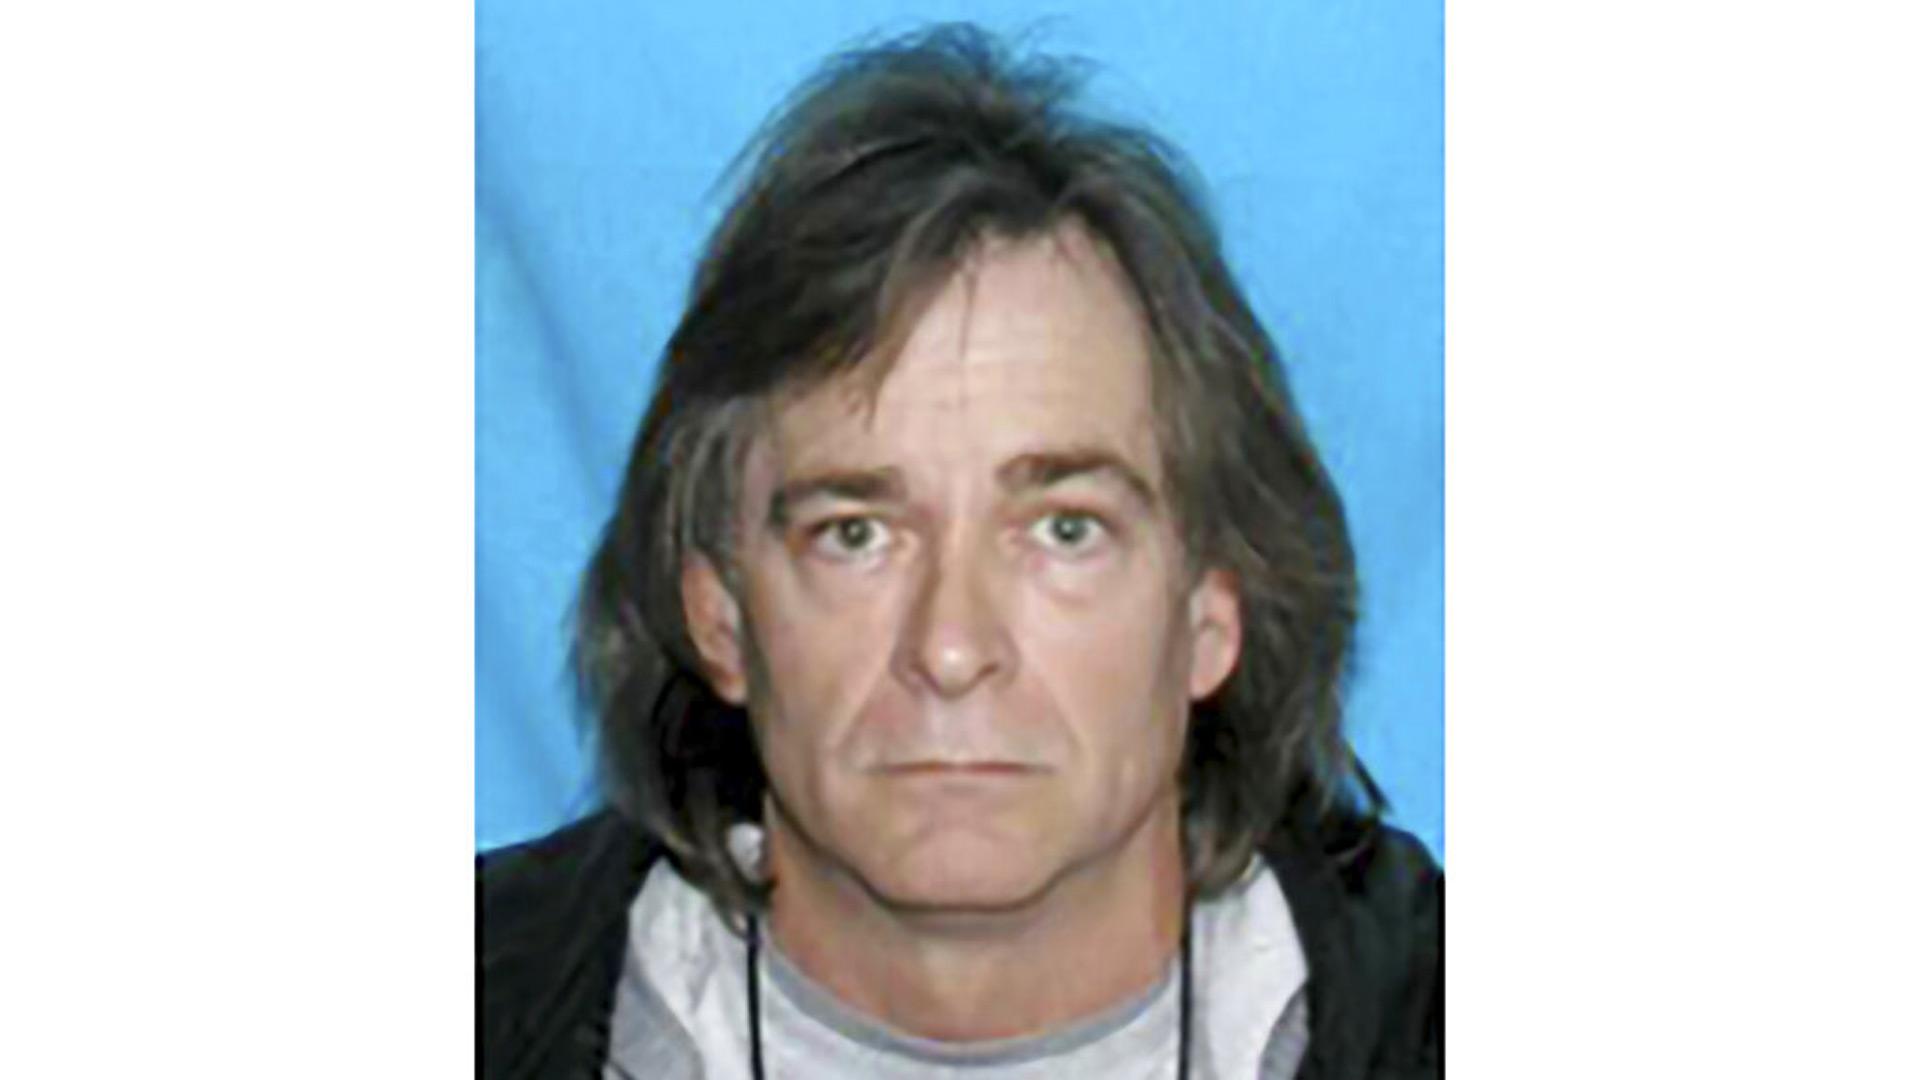 Nashville bombing suspect